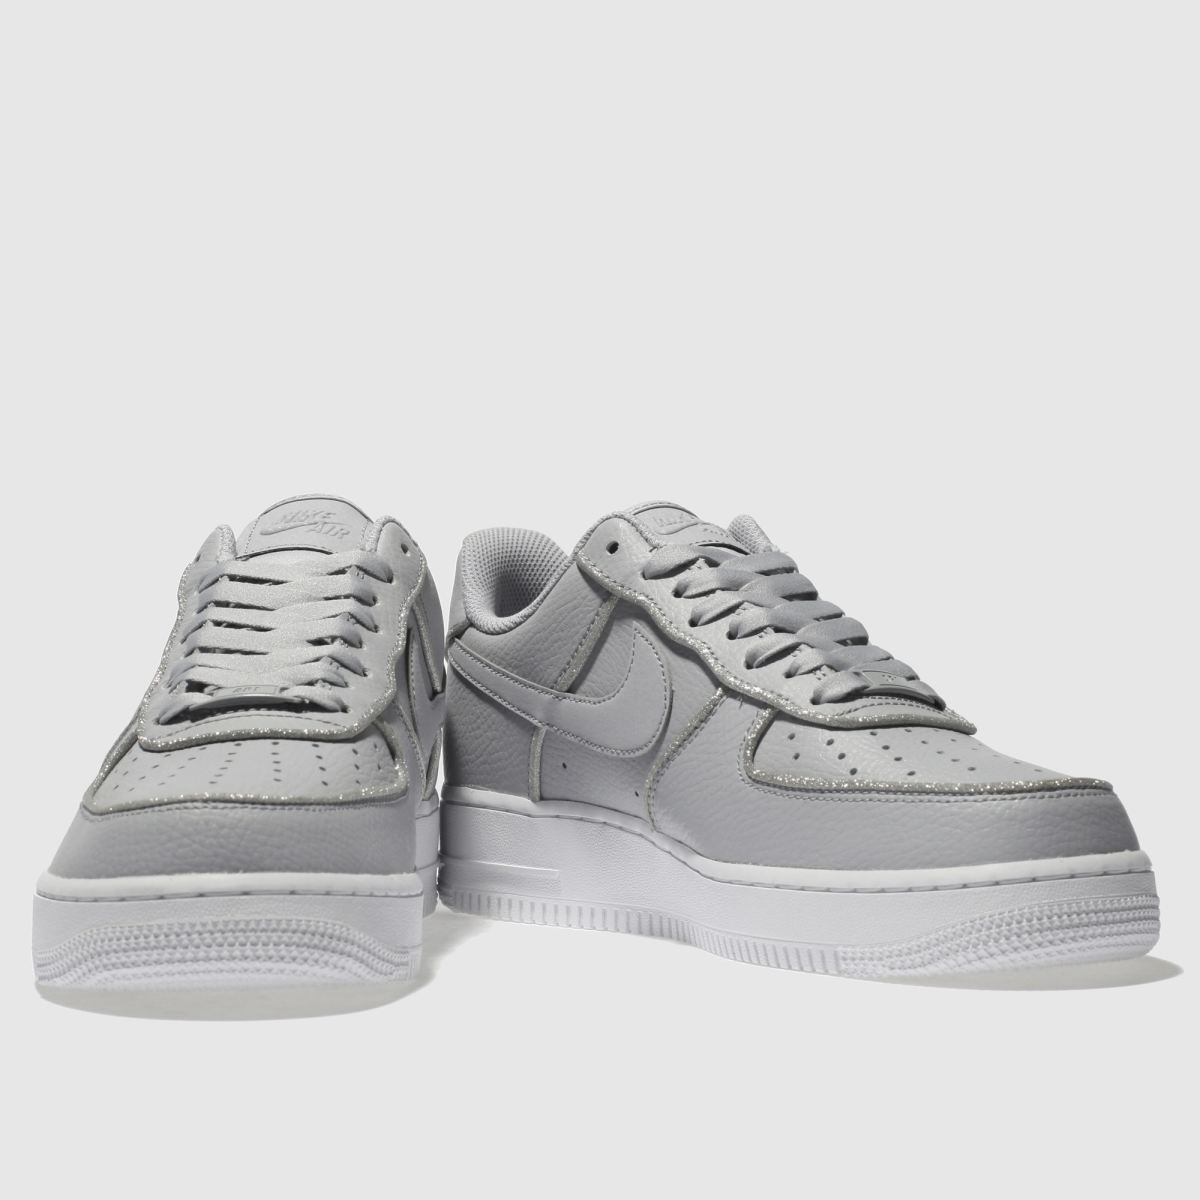 Damen Grau nike Air Force 1 Lo Sneaker | Schuhe schuh Gute Qualität beliebte Schuhe | d39add